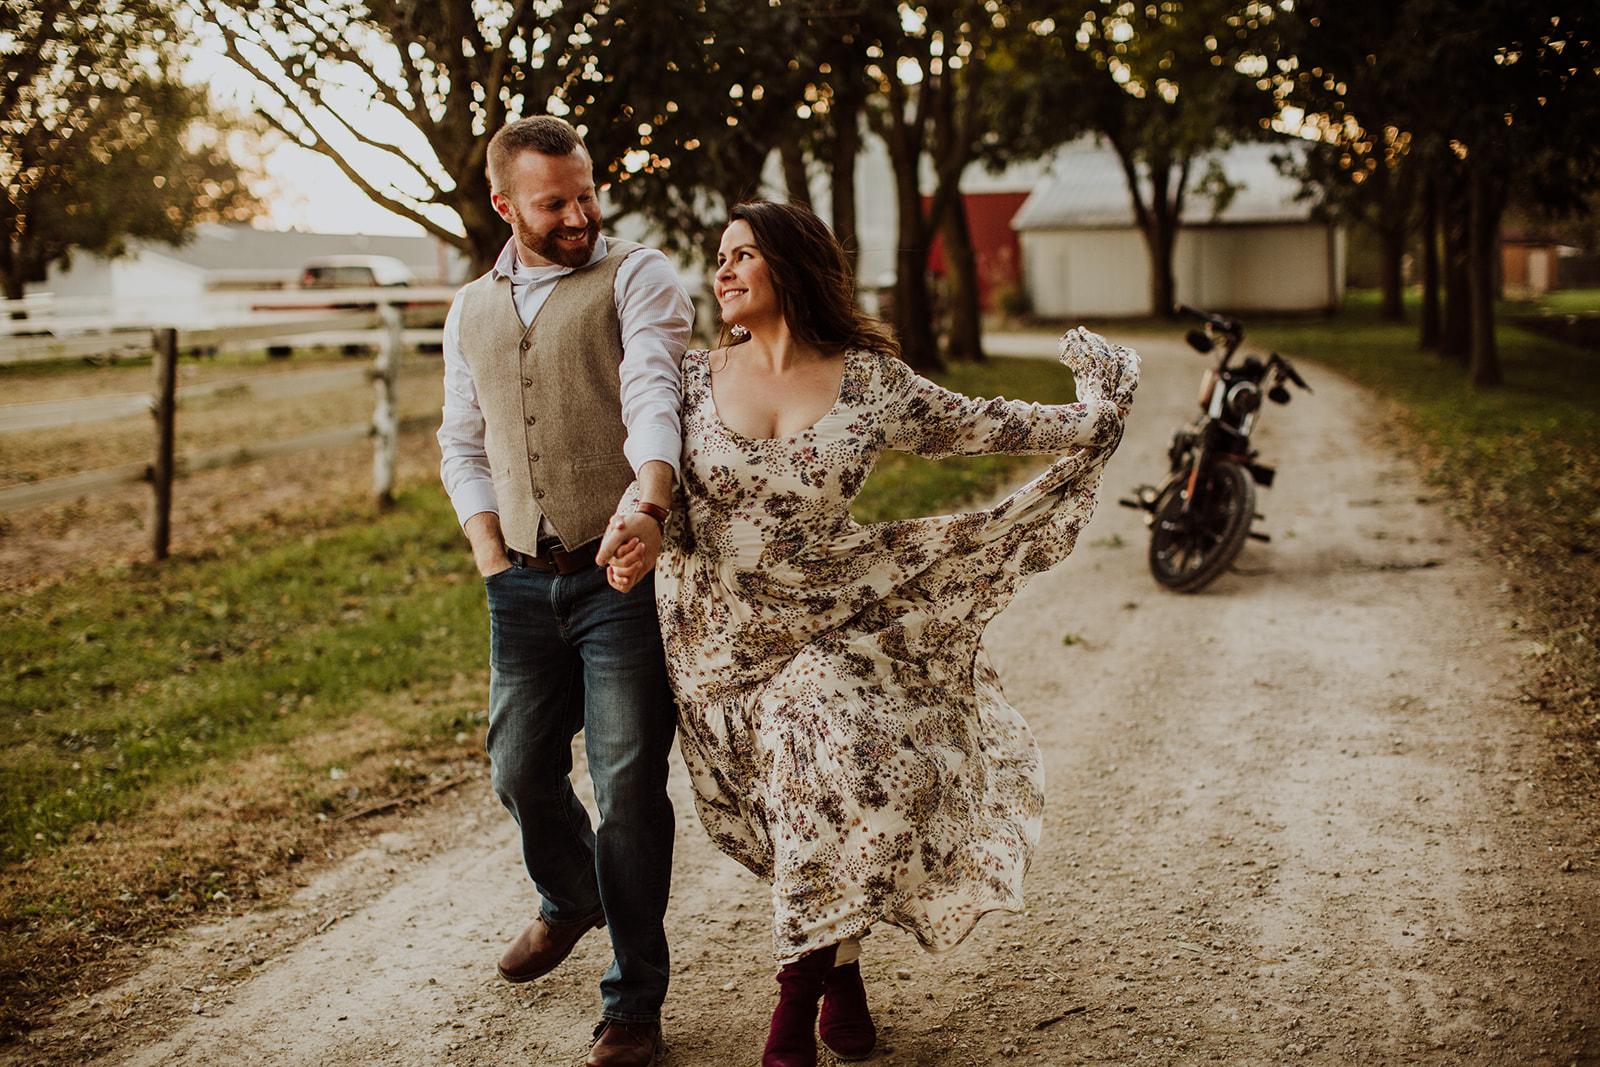 Sarah & Nick's Free Spirit Engagement - Springfield, IL